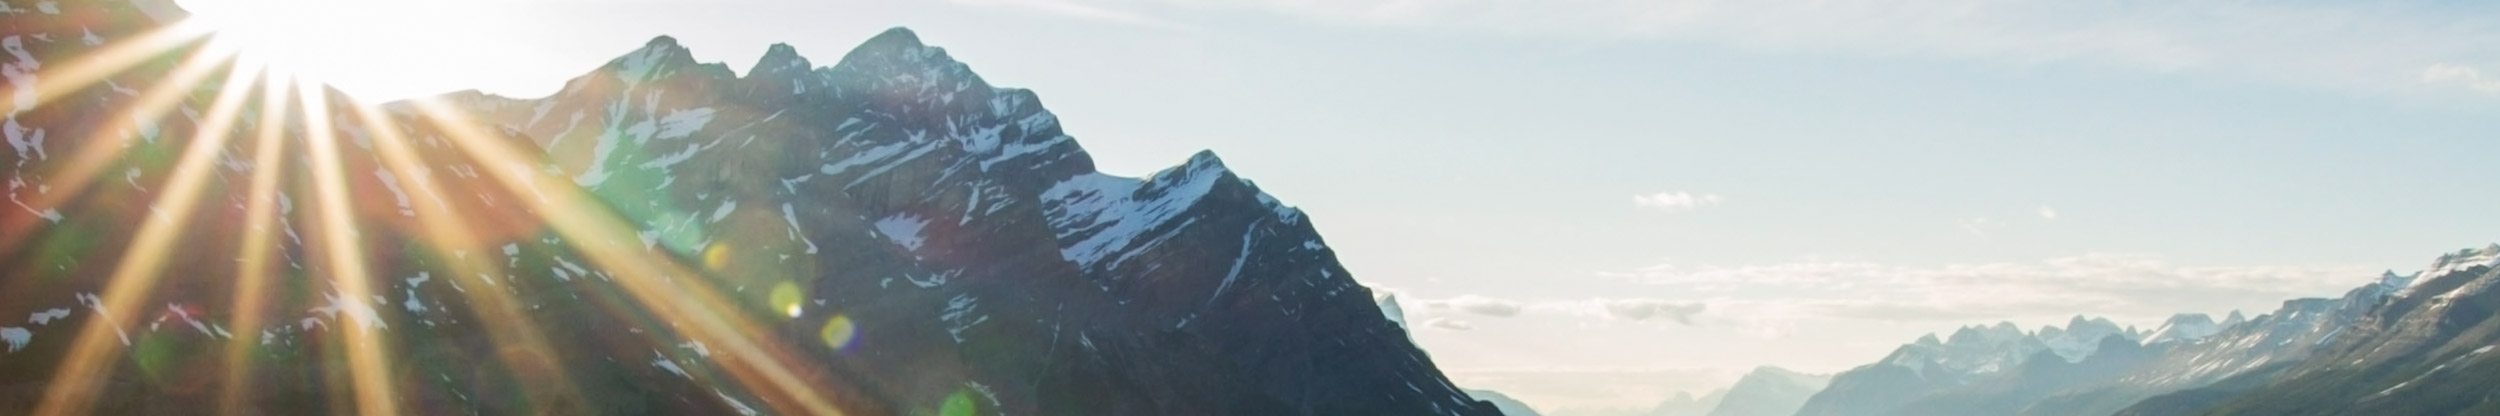 Kanada Berge